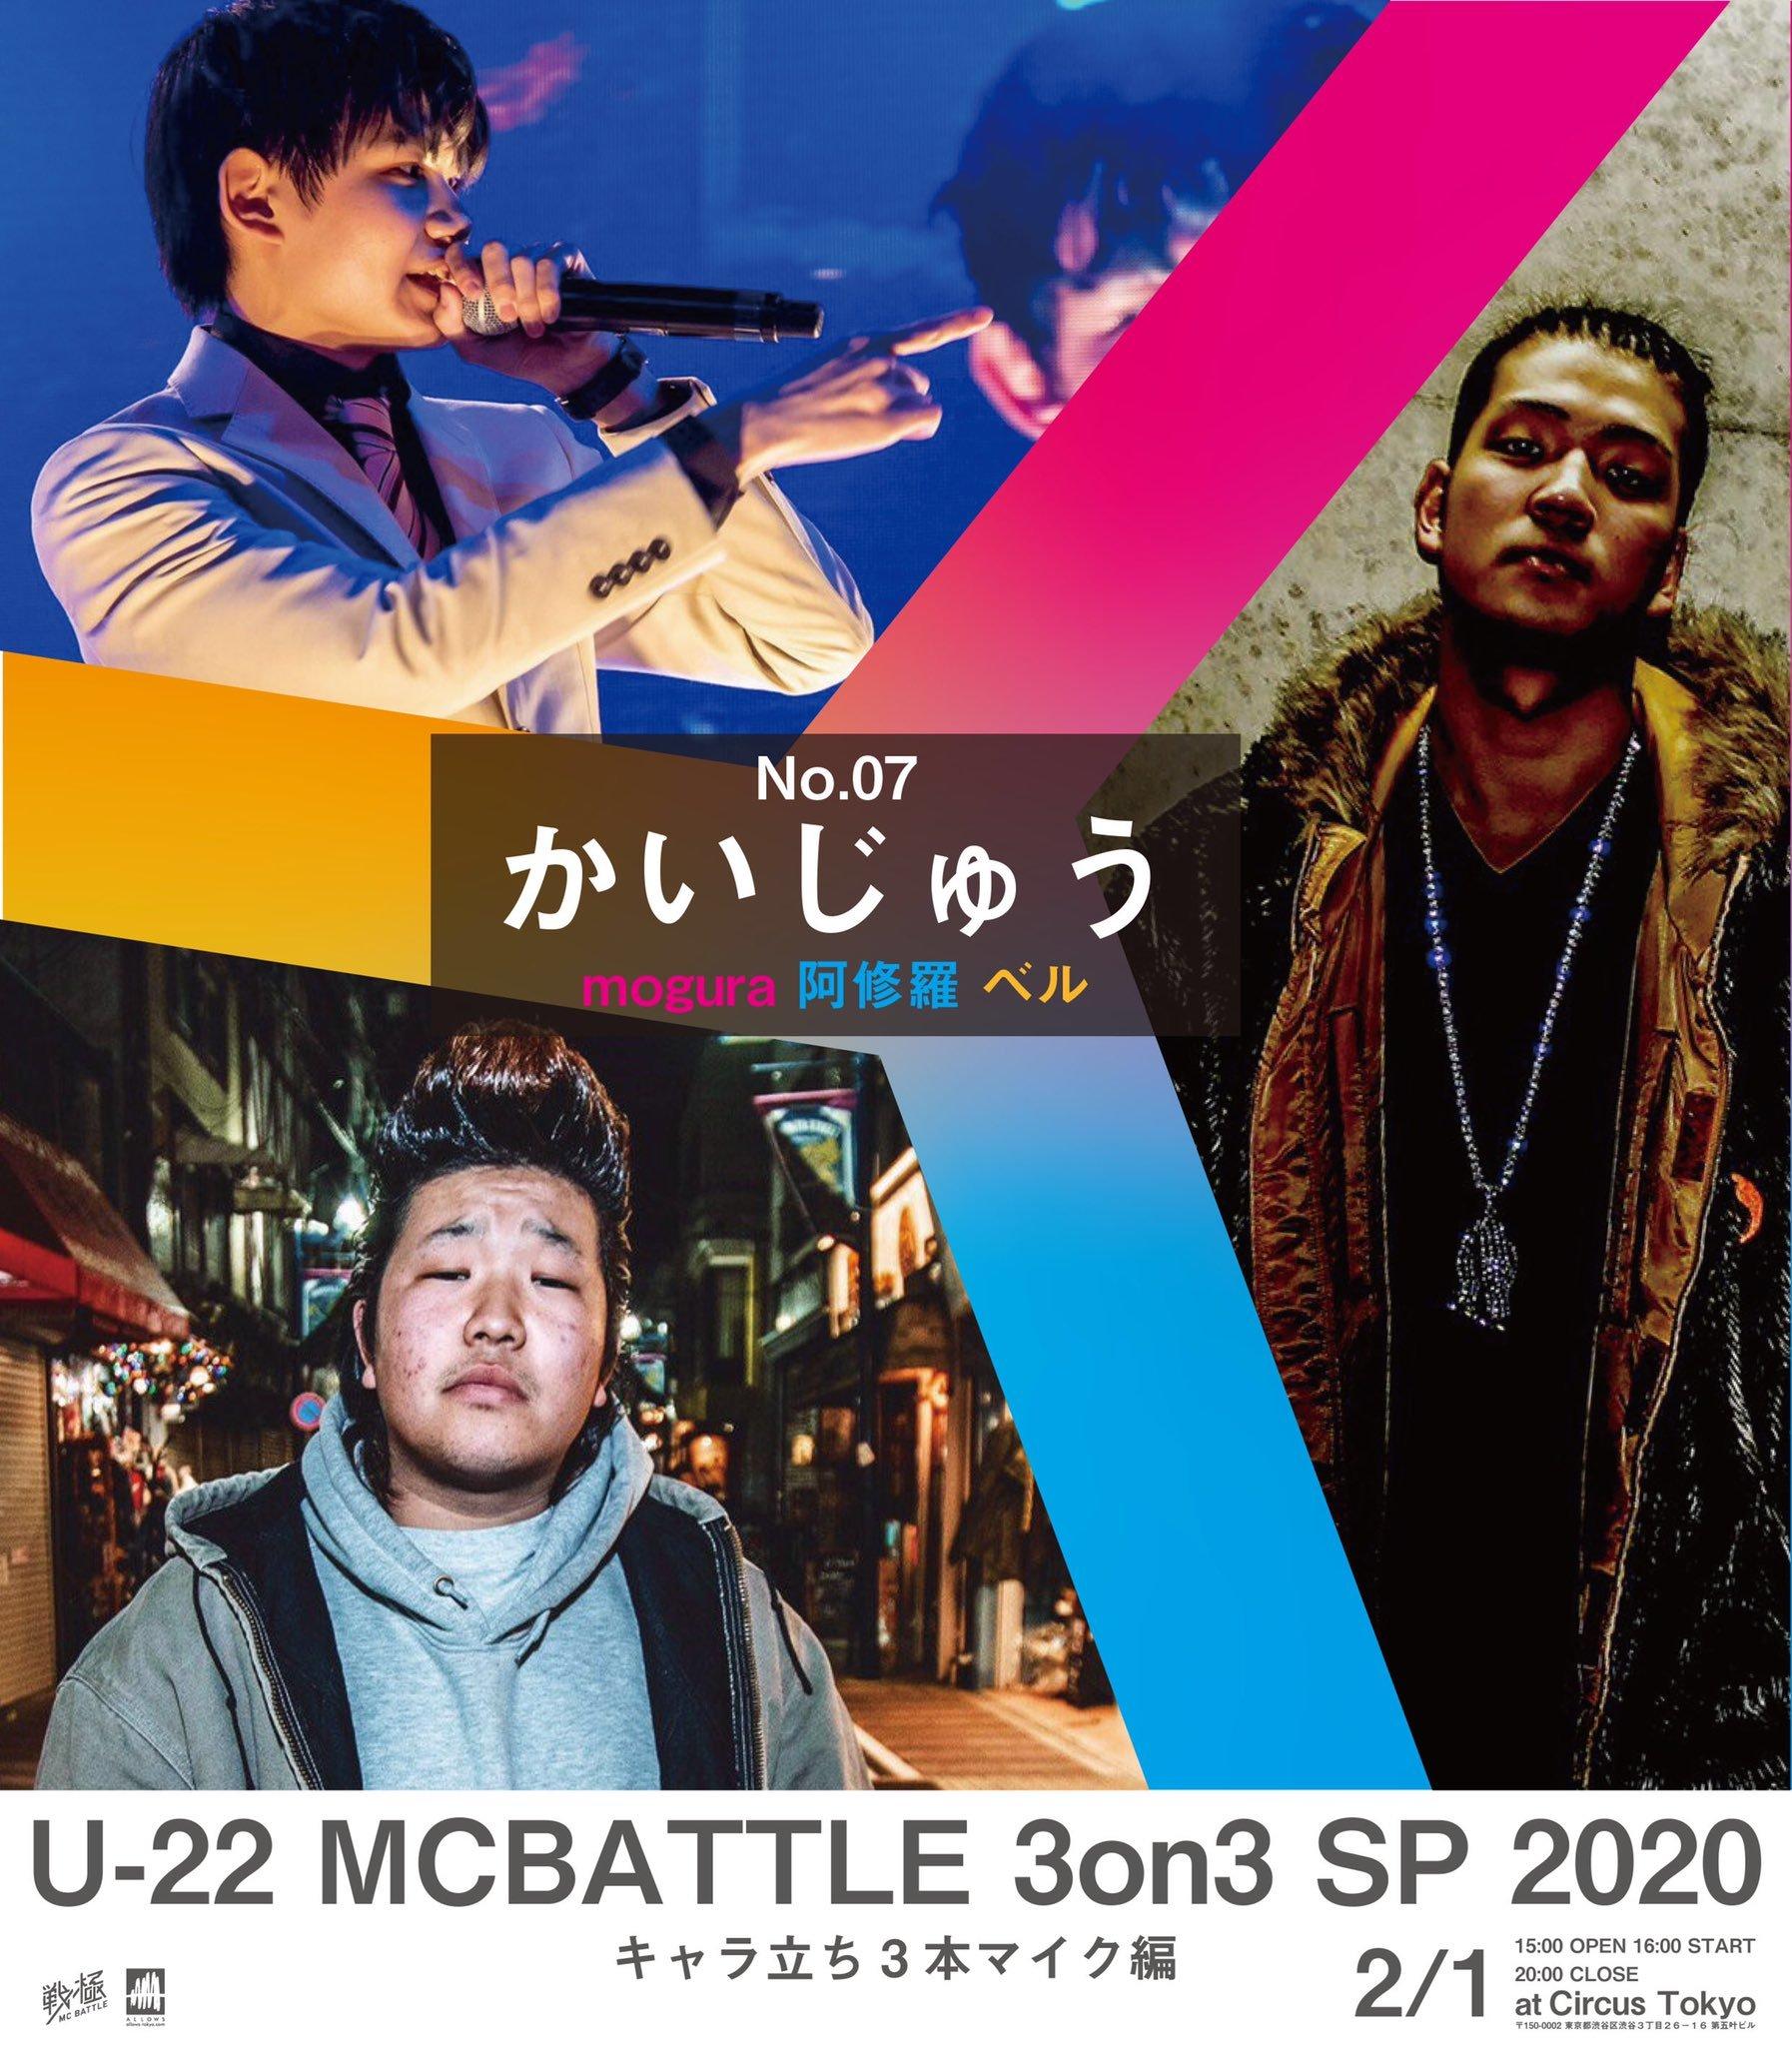 2/1 U-22 MCBATTLE 3on3 SP 2020 チケット販売開始!8チーム中!_e0246863_16335477.jpg